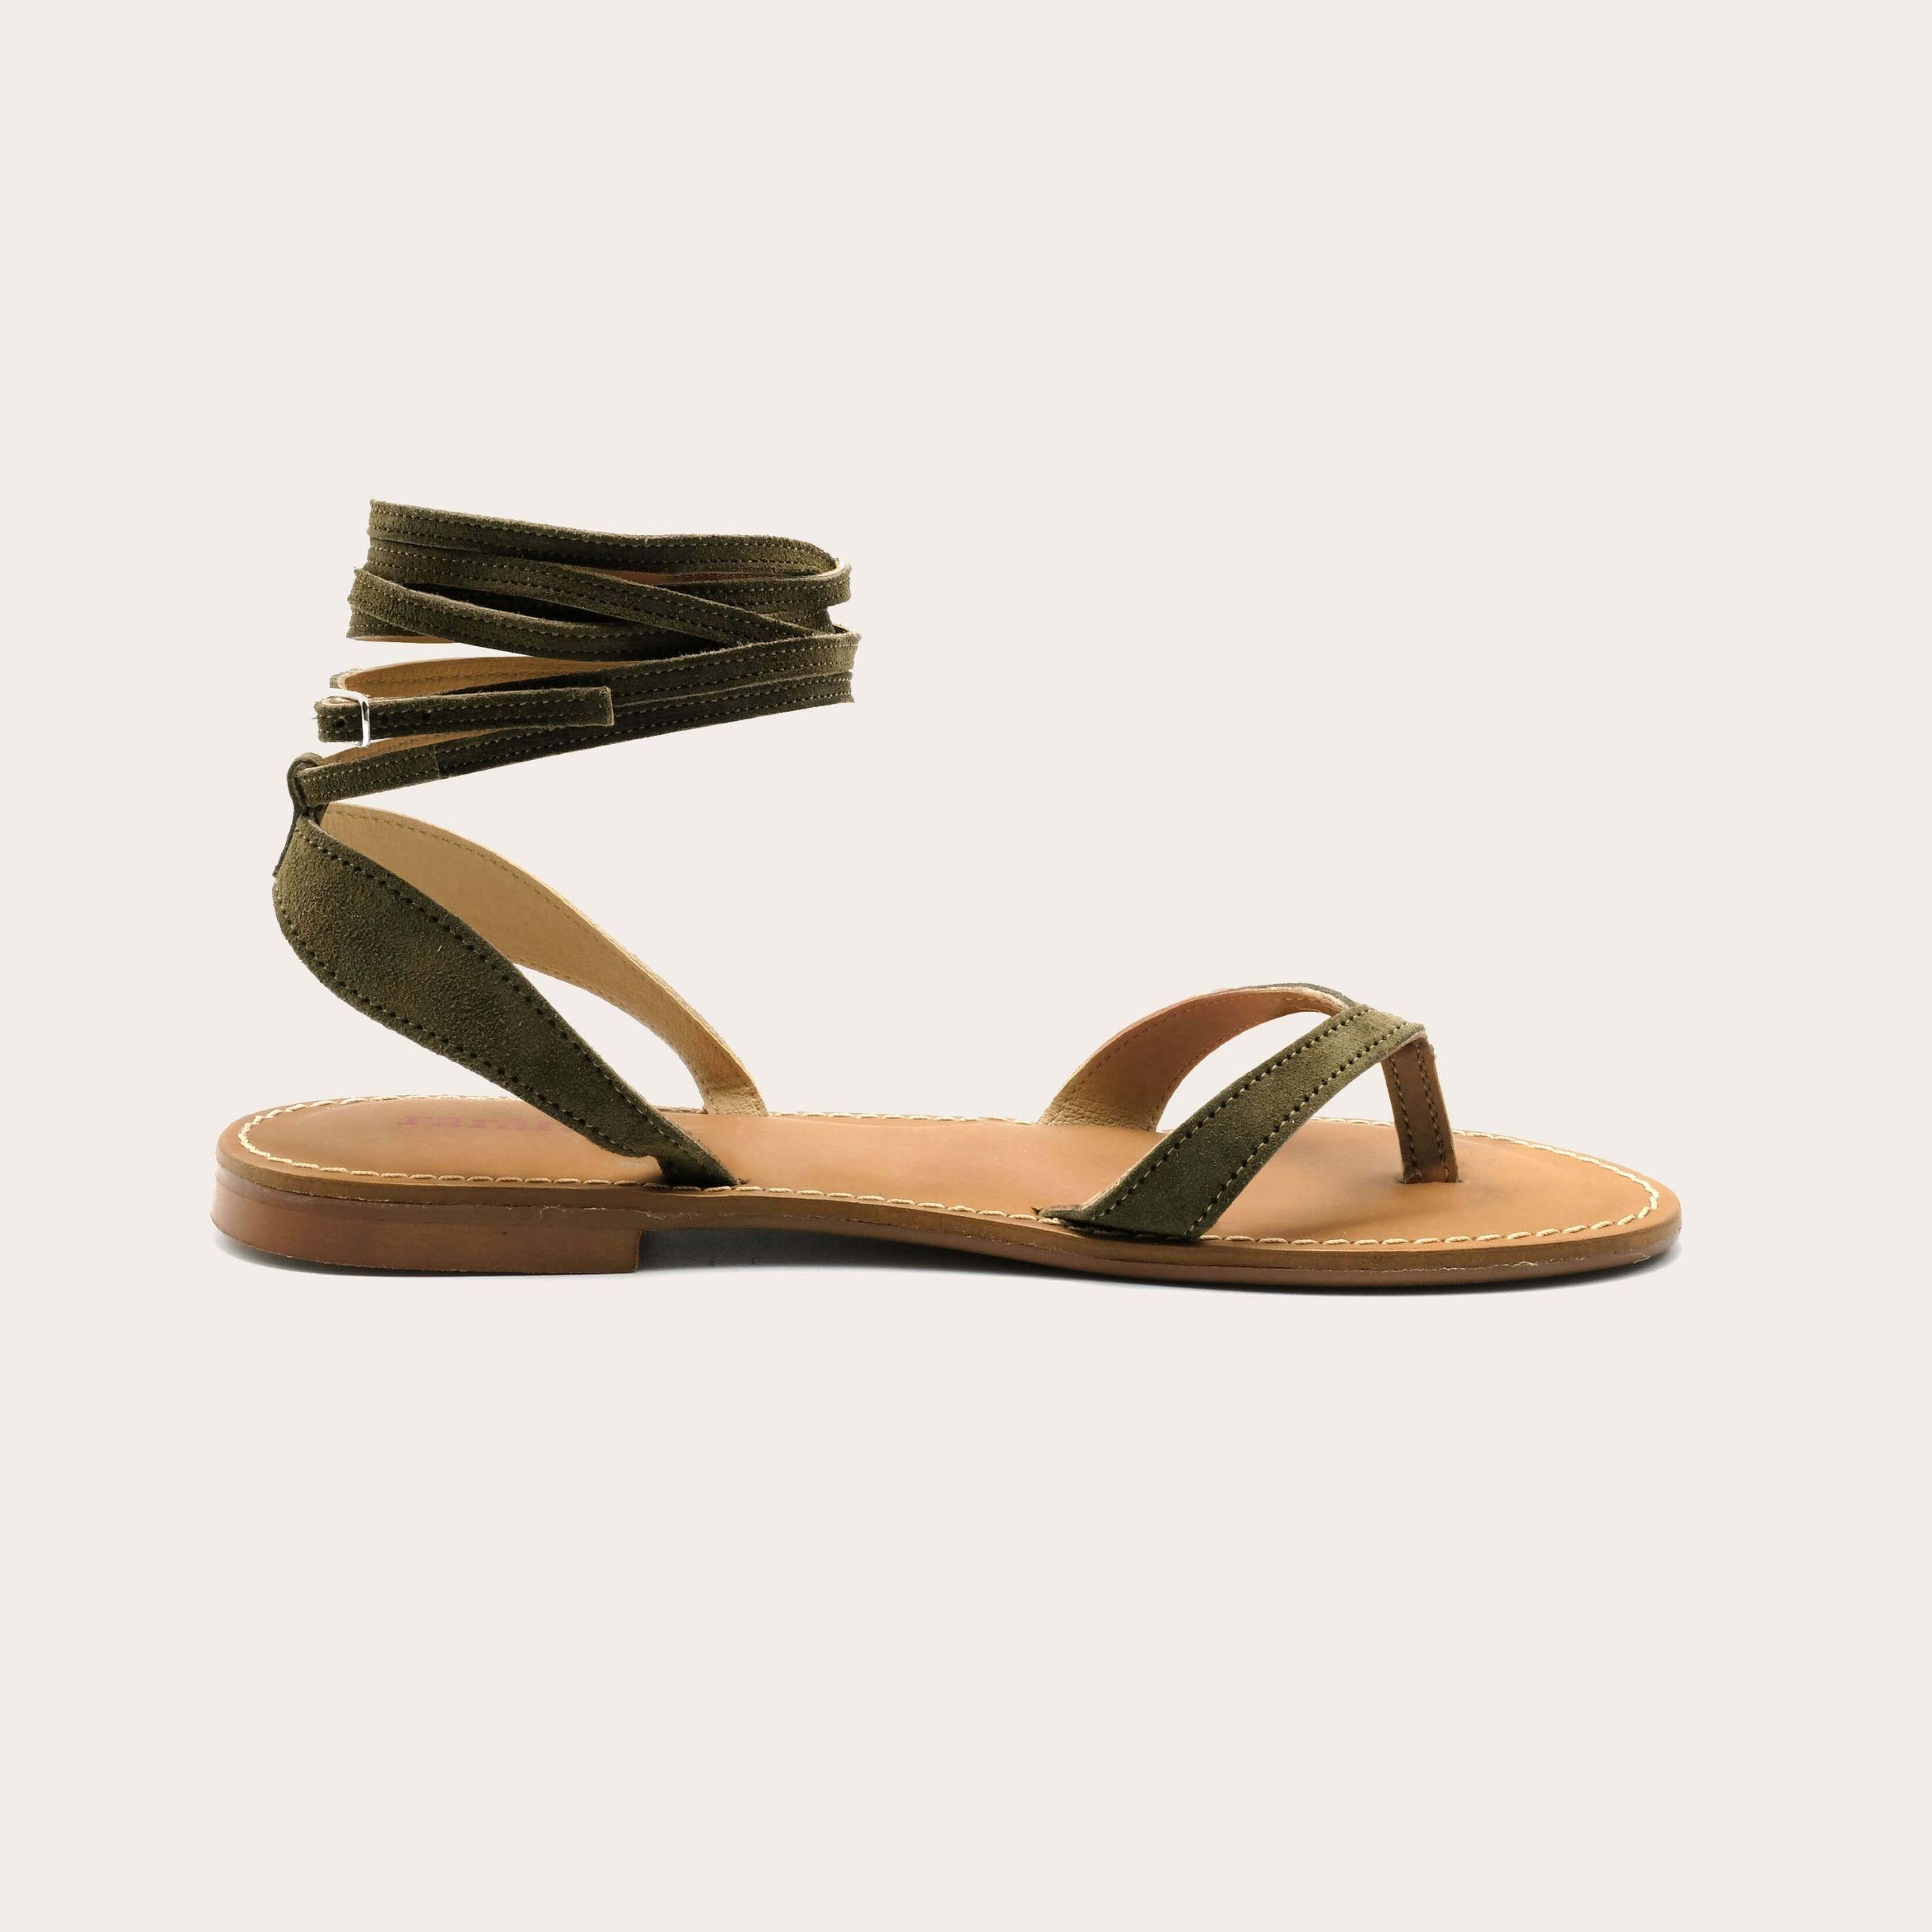 sierra-khaki_lintsandalen sandals travelsandals vegan sustainable sandals wikkelsandalen